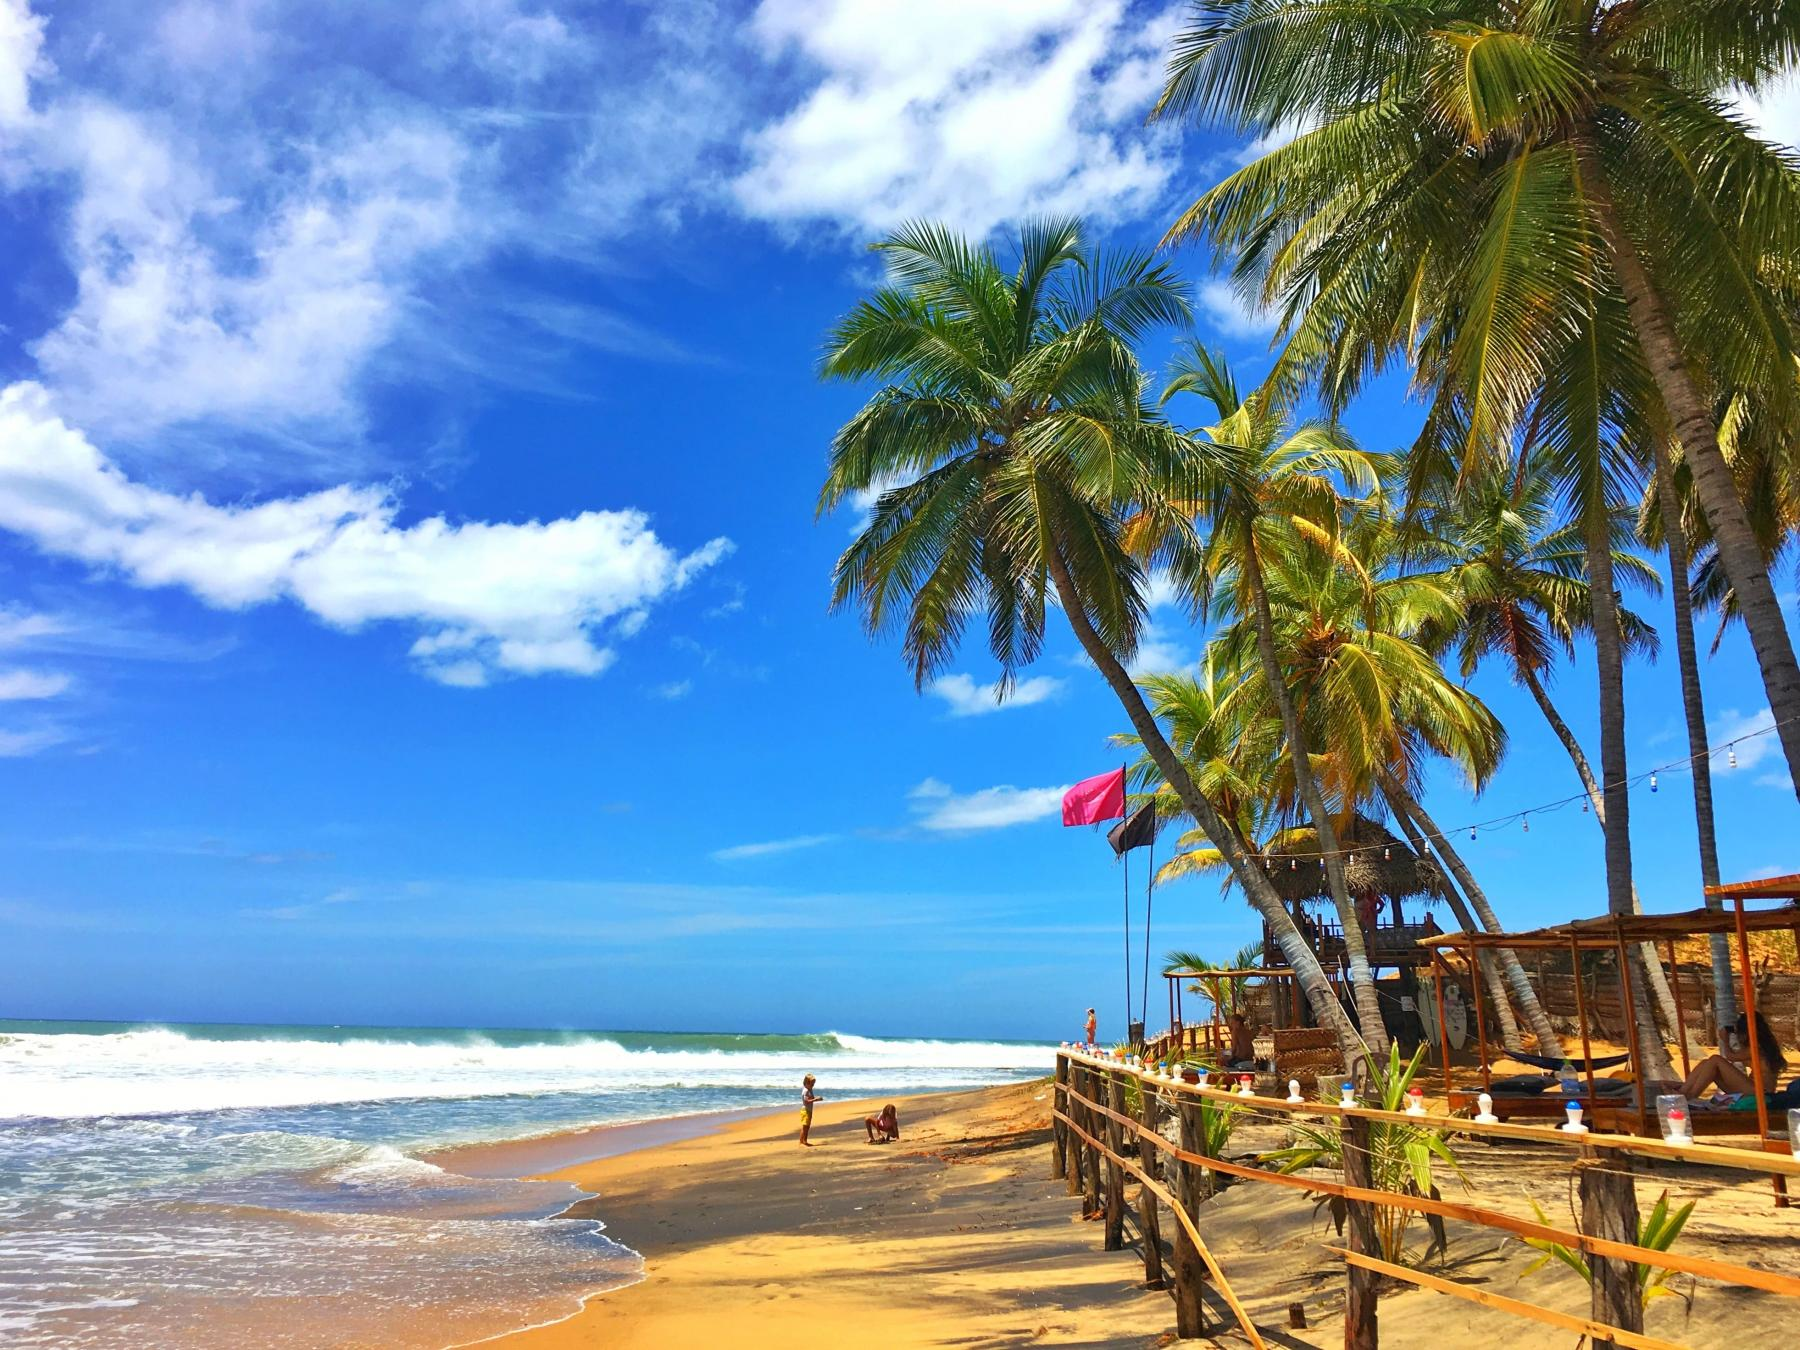 Okanda beach